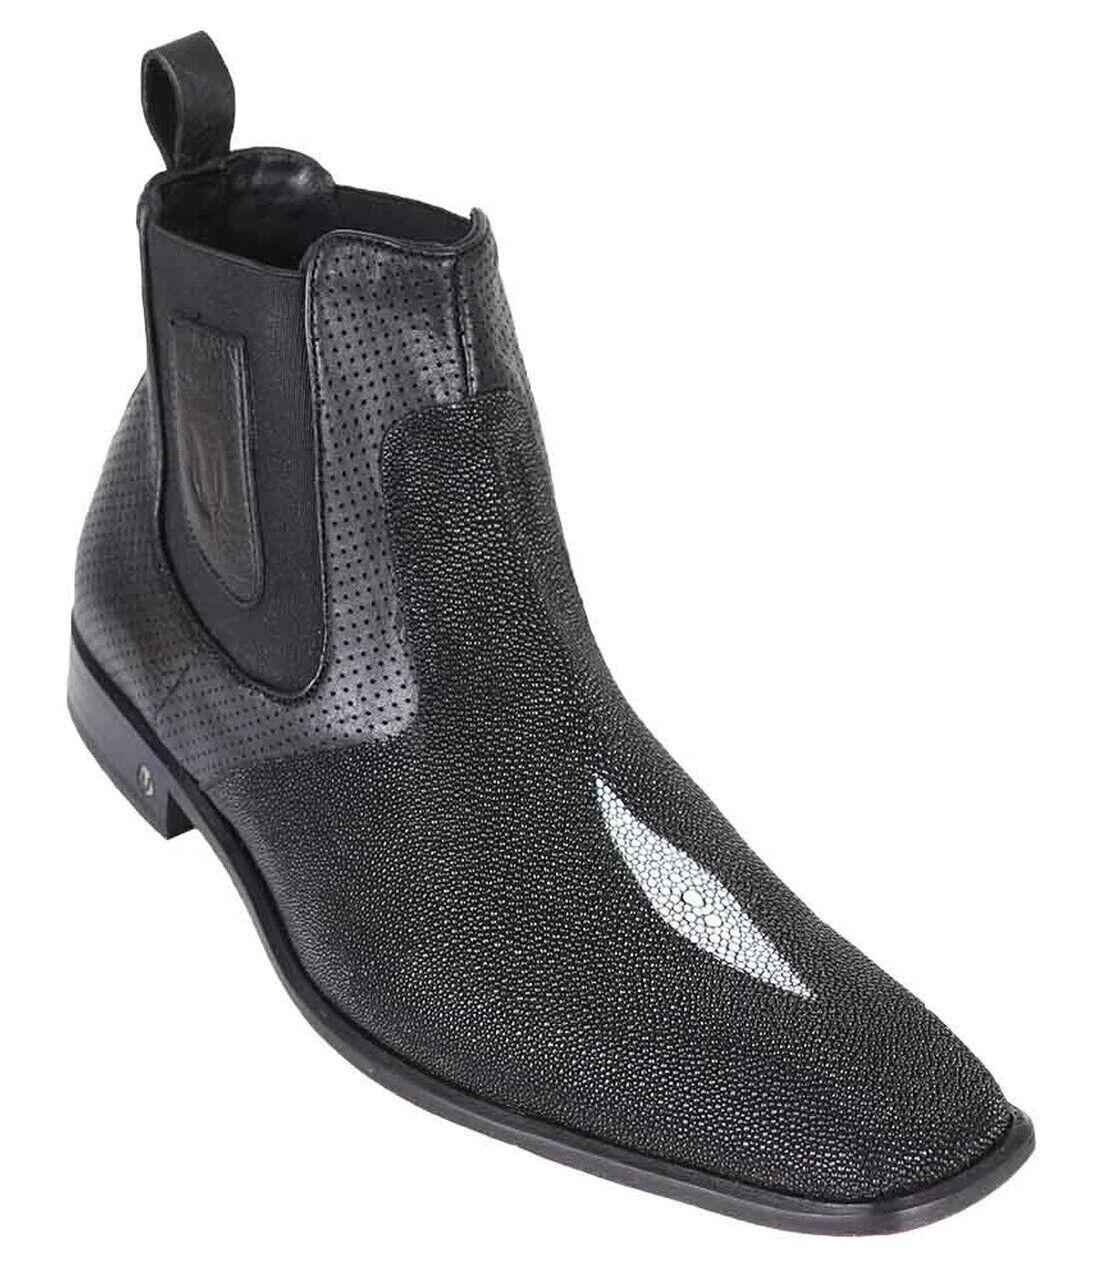 Men's Vestigium Genuine Single Stone Stingray Casual Ankle Boots Handmade